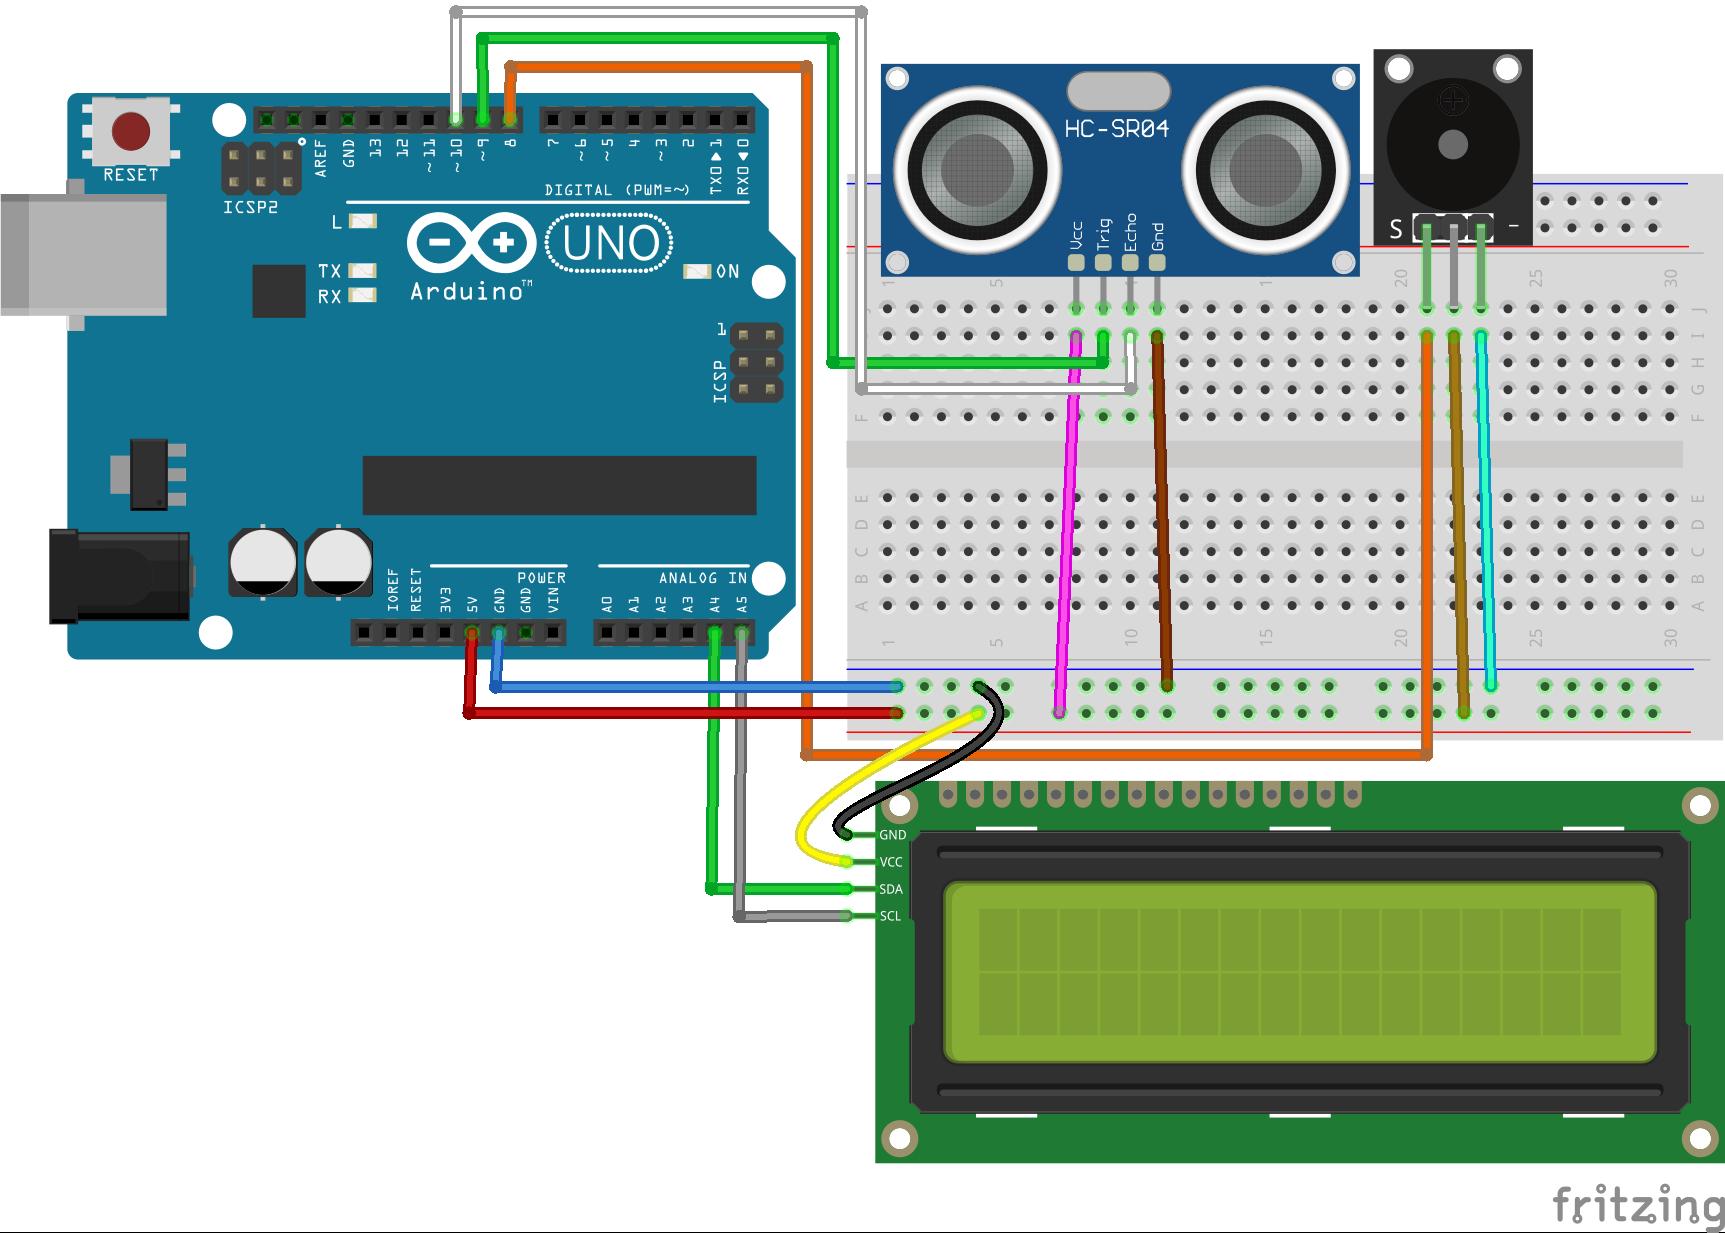 Arduino HC-SR04 ile Mesafe Ölçme